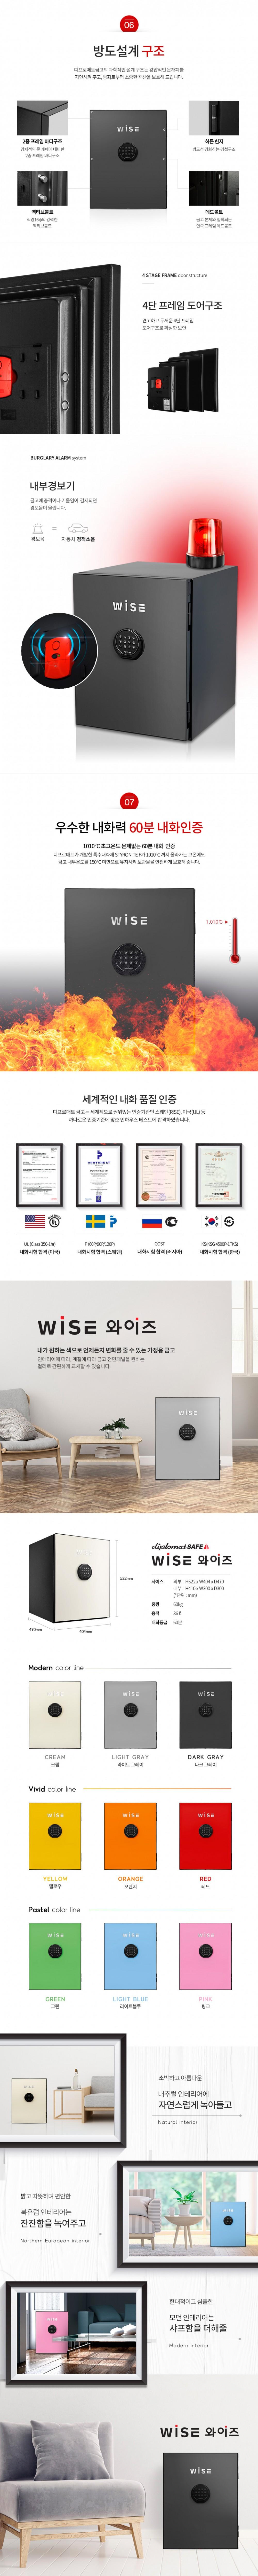 WiSE3.jpg